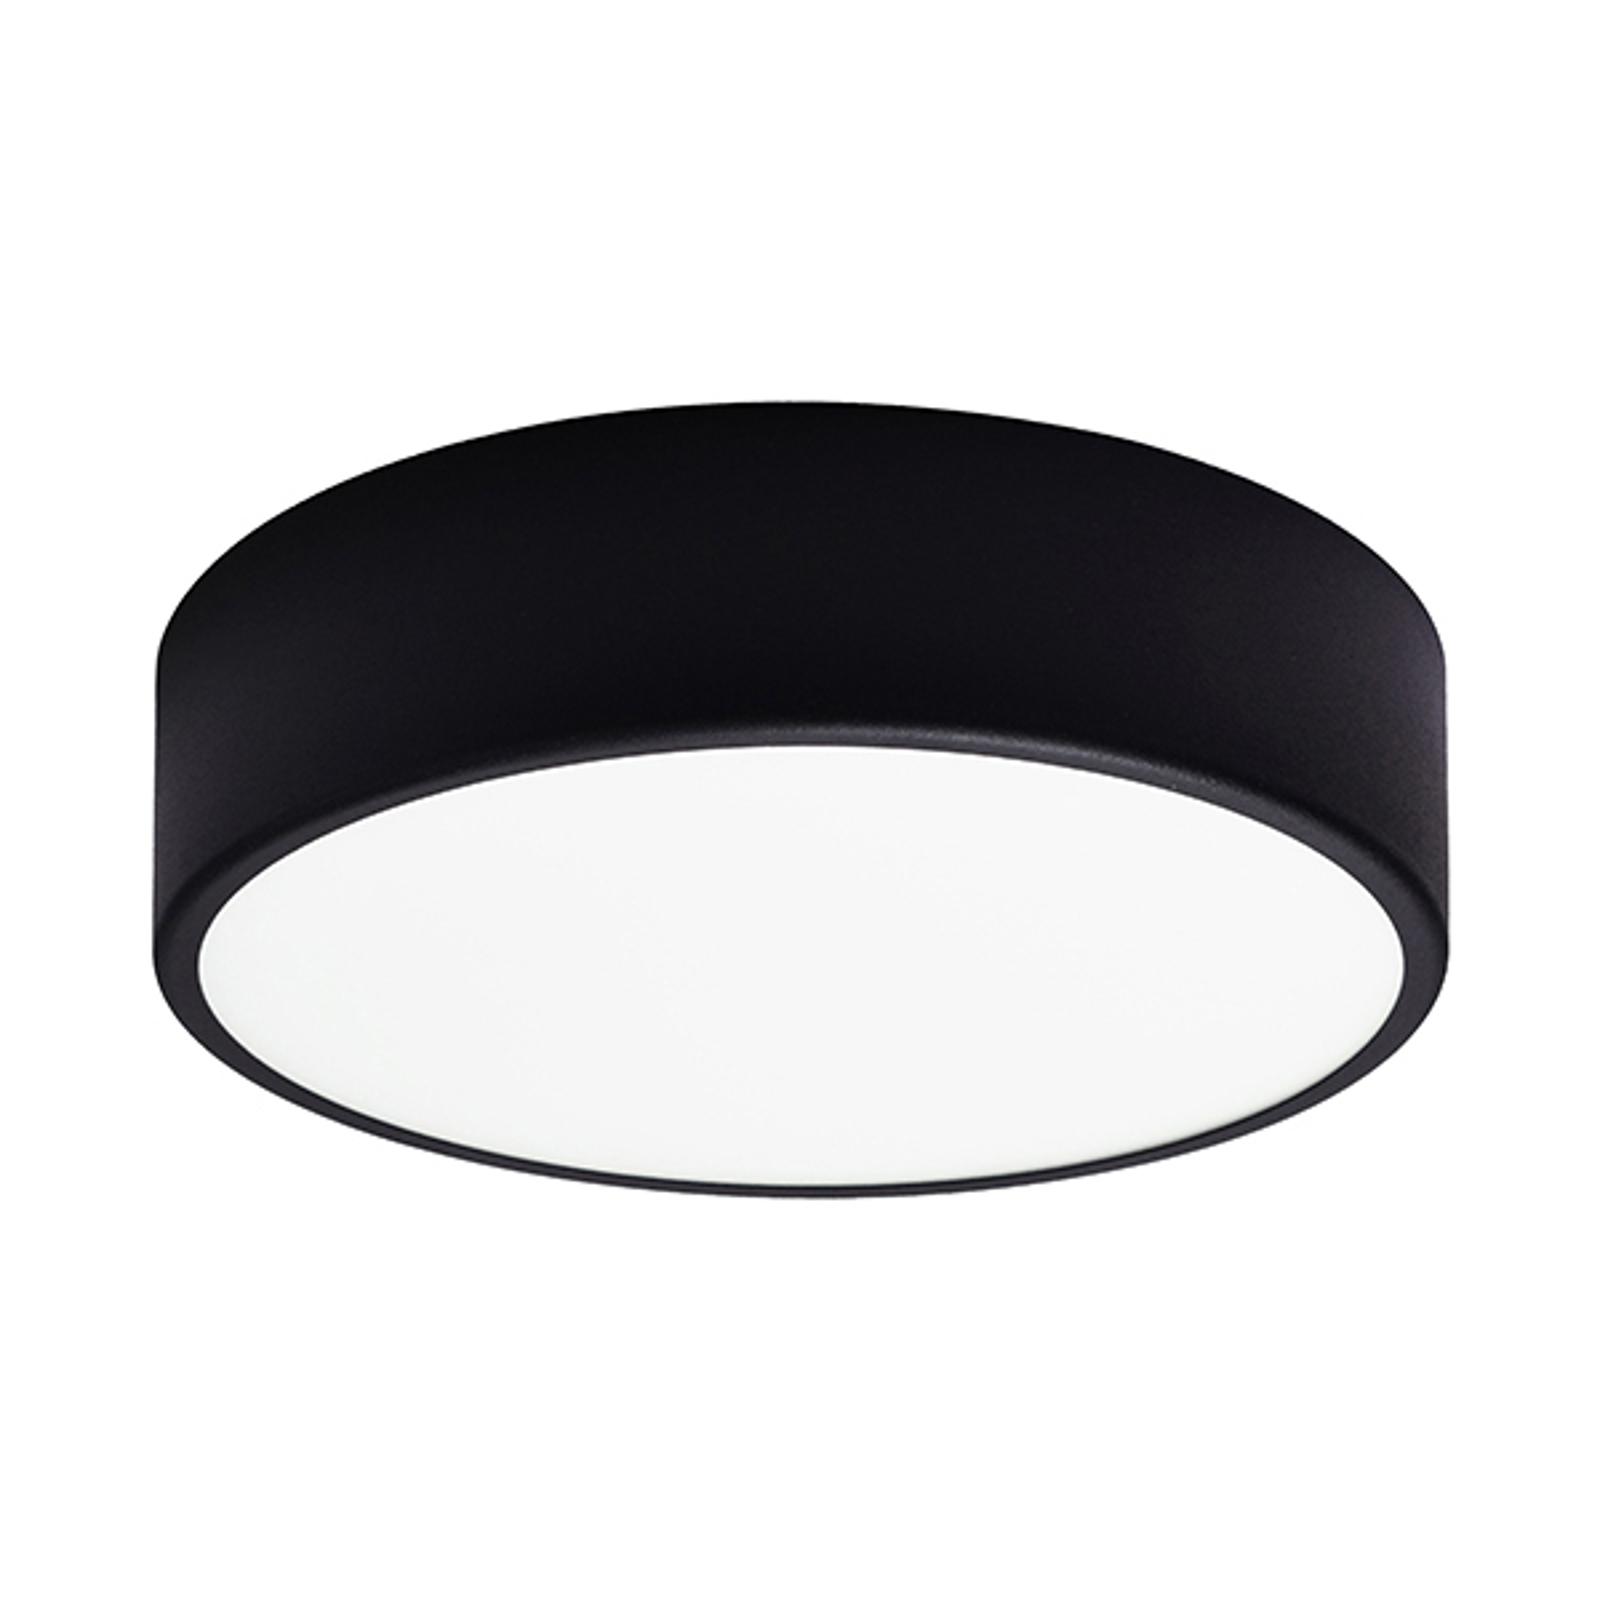 Taklampe Cleo, Ø 30 cm, svart